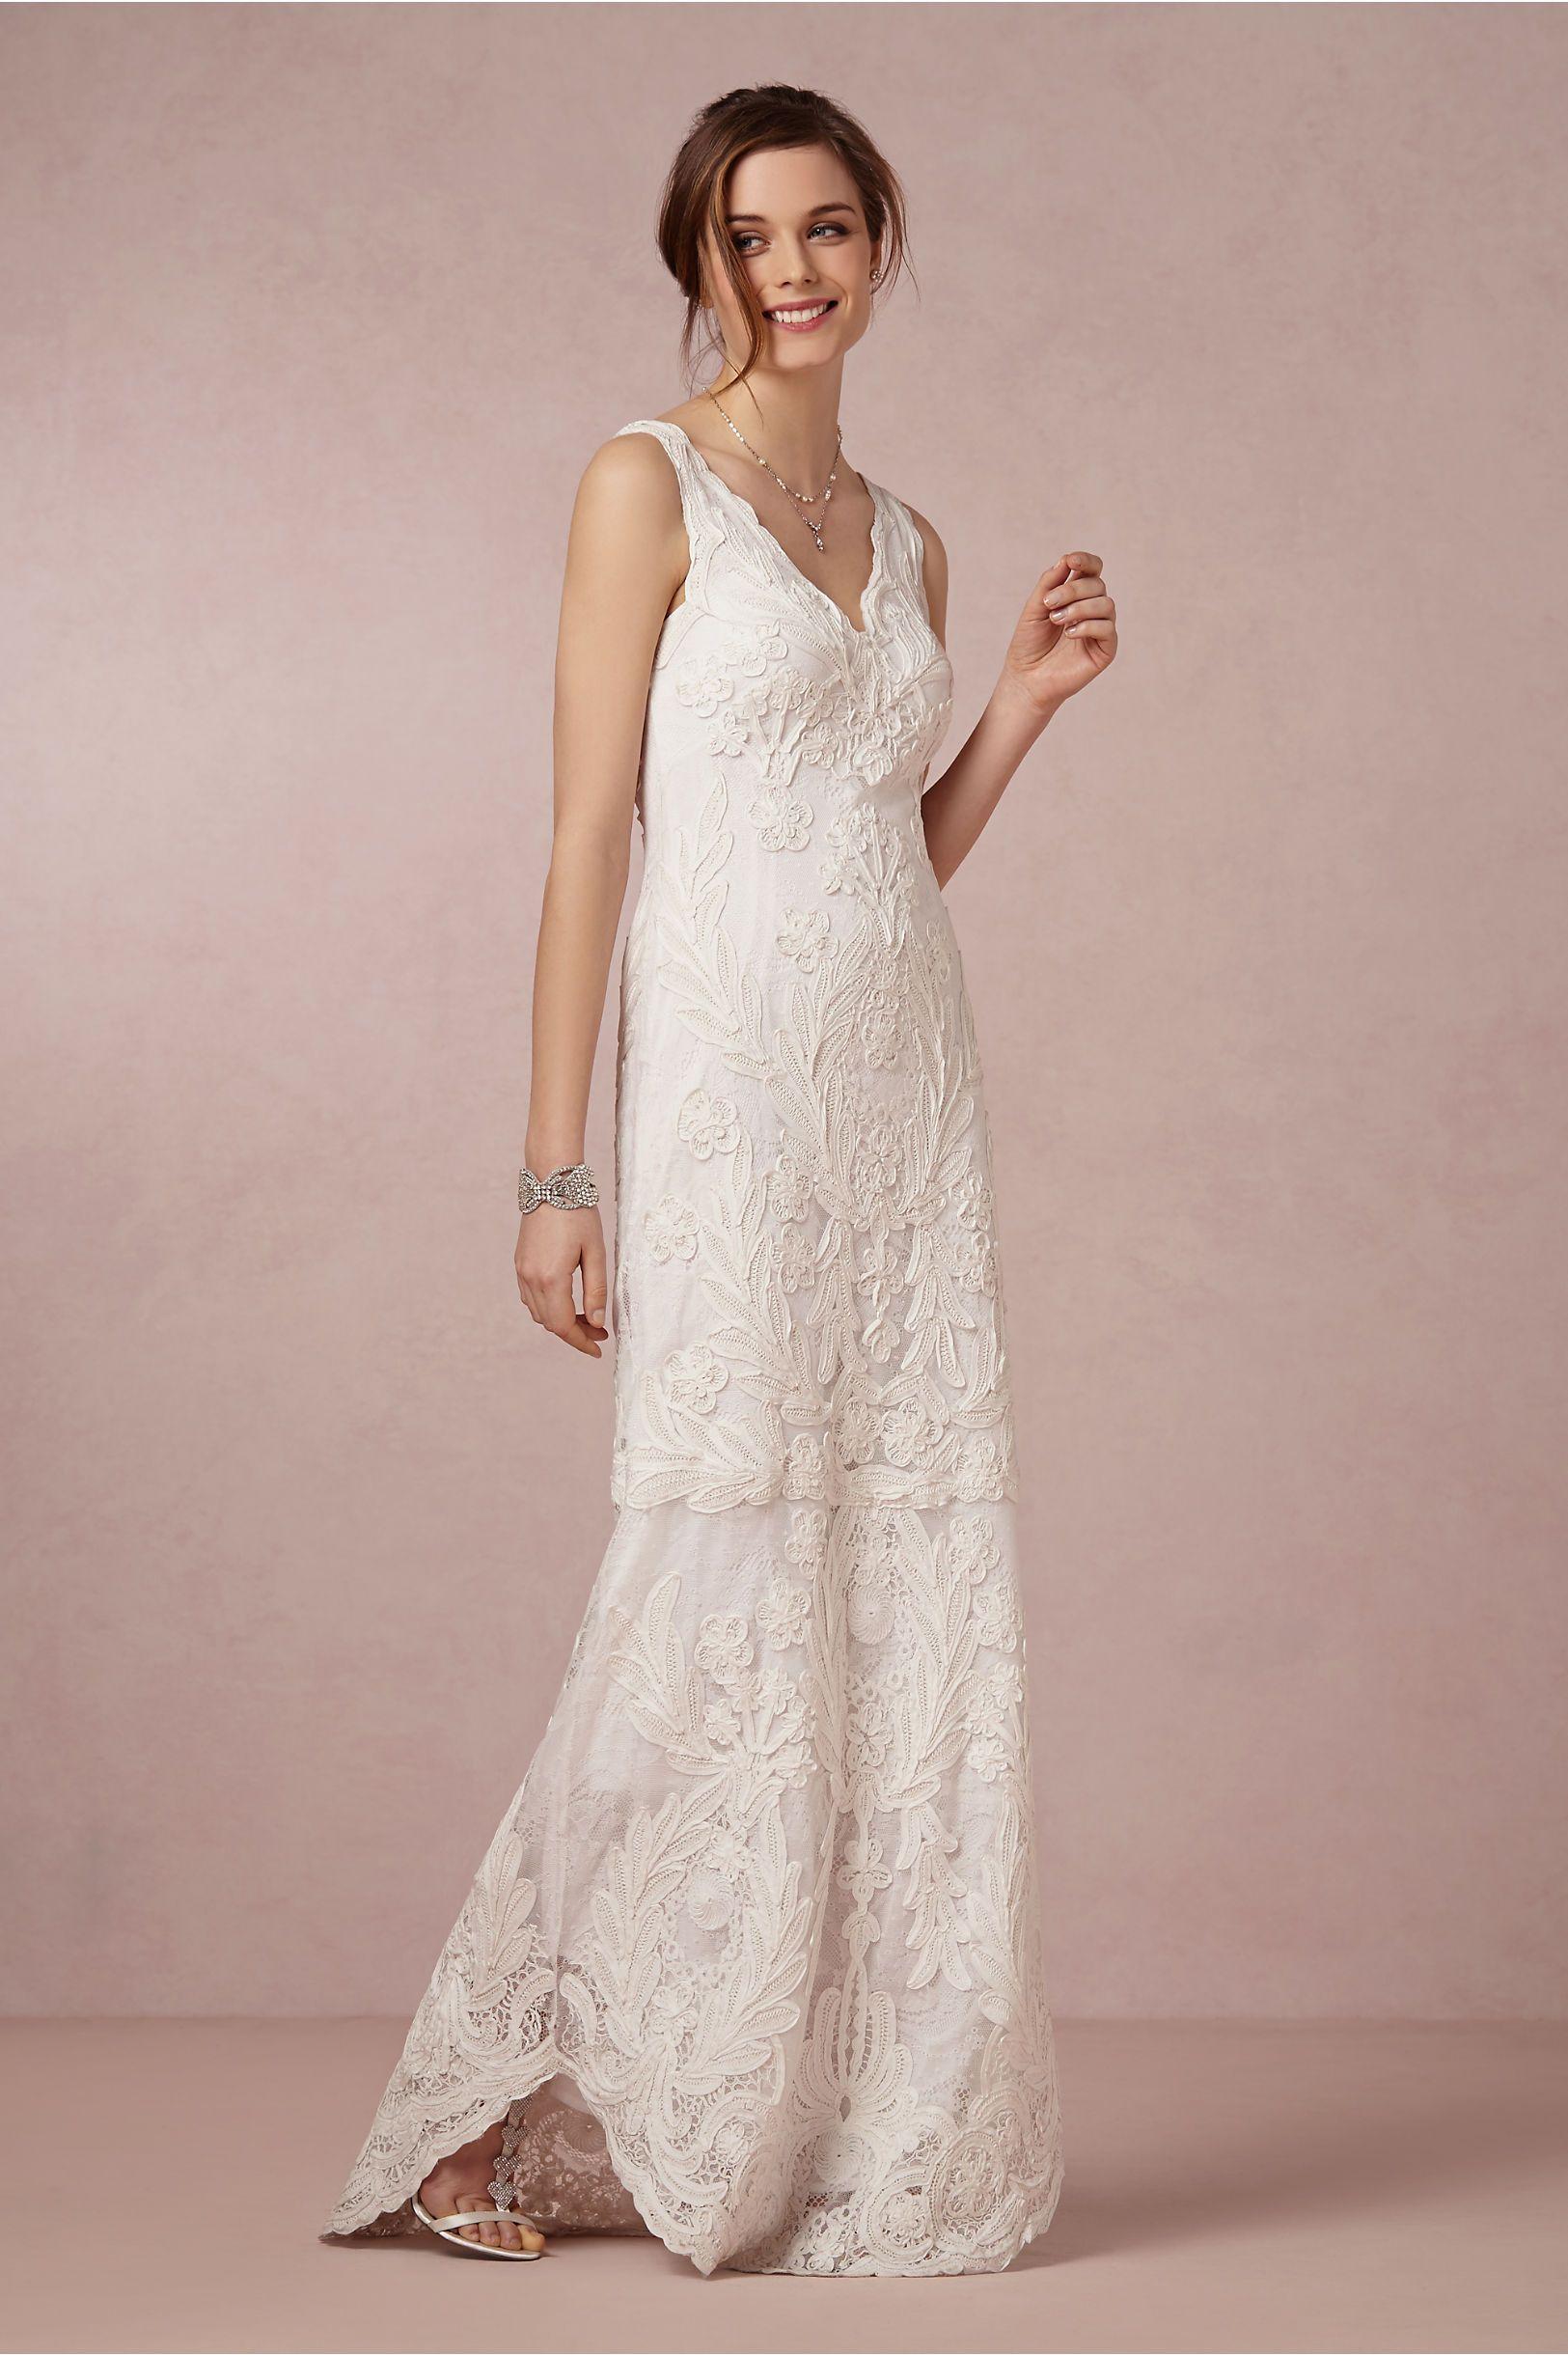 Aberdeen gown in bride wedding dresses at bhldn the wedding dress